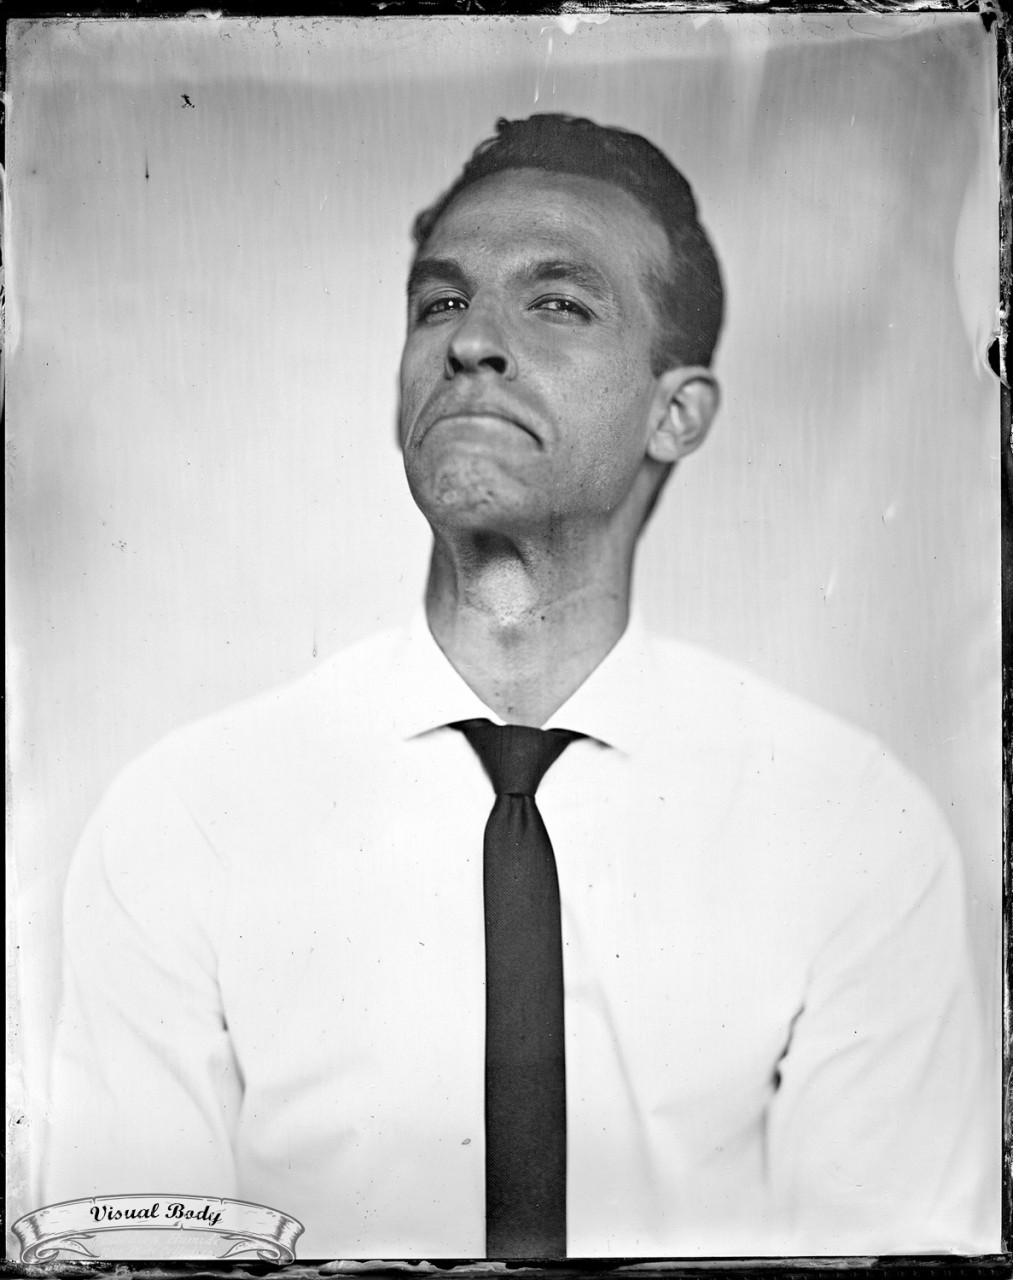 Olivier Martineau. Profession: humoriste/comedian.